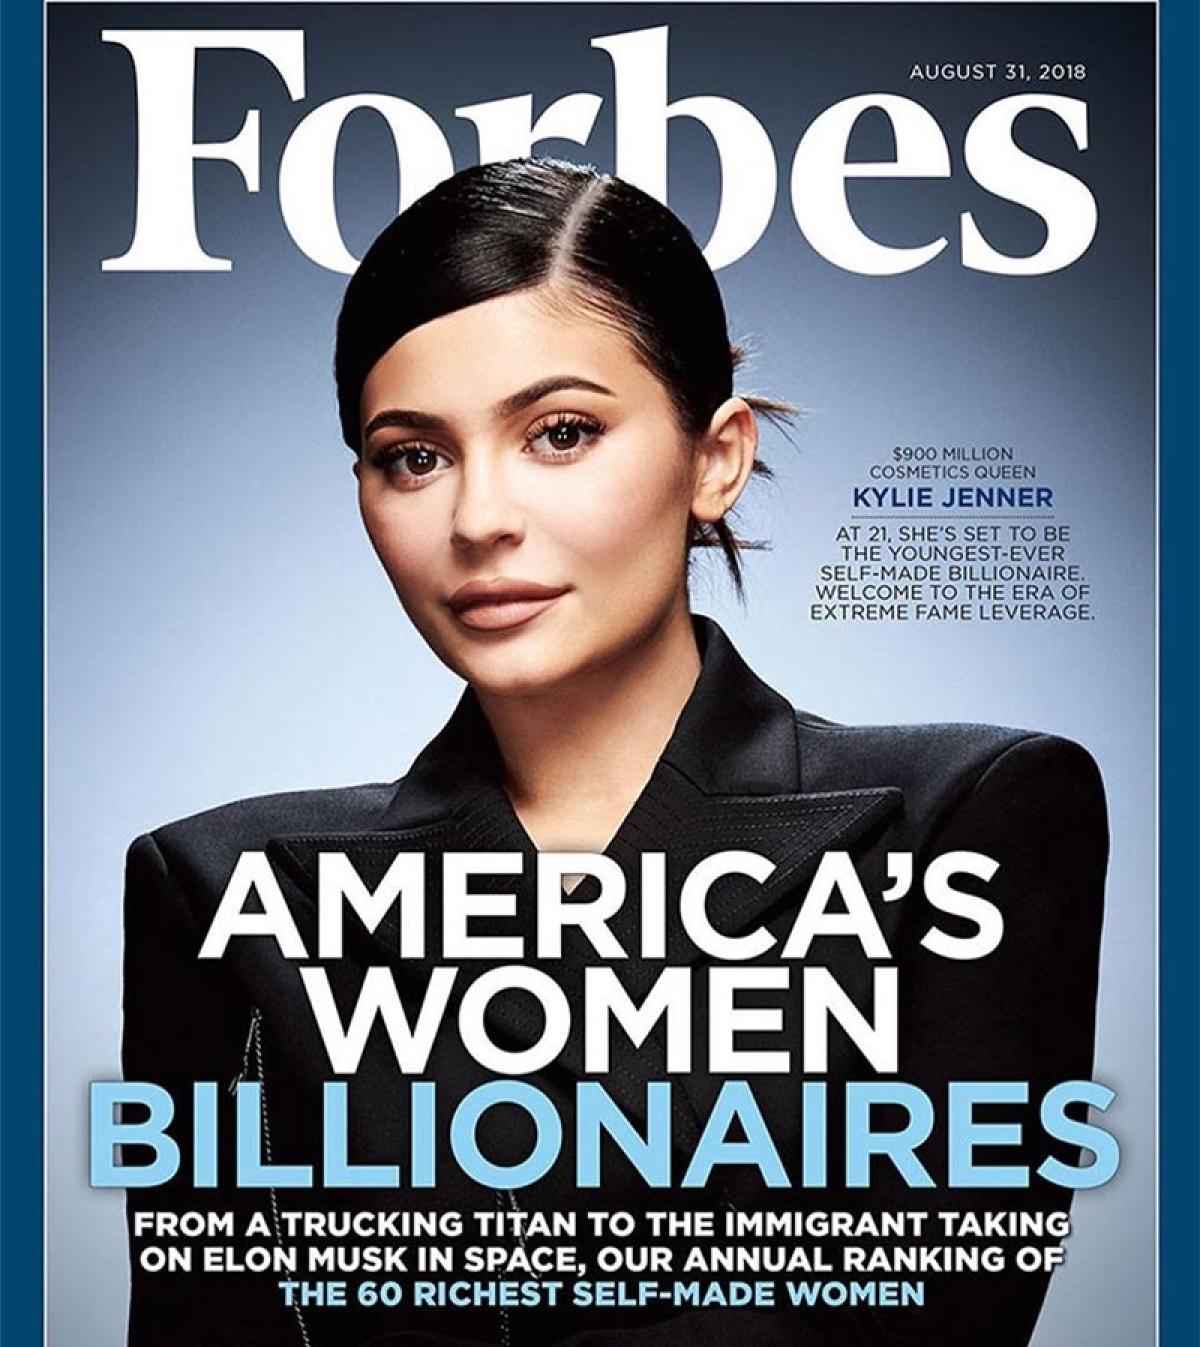 Internet enraged over 'youngest billionaire' Kylie Jenner beating Mark Zuckerberg